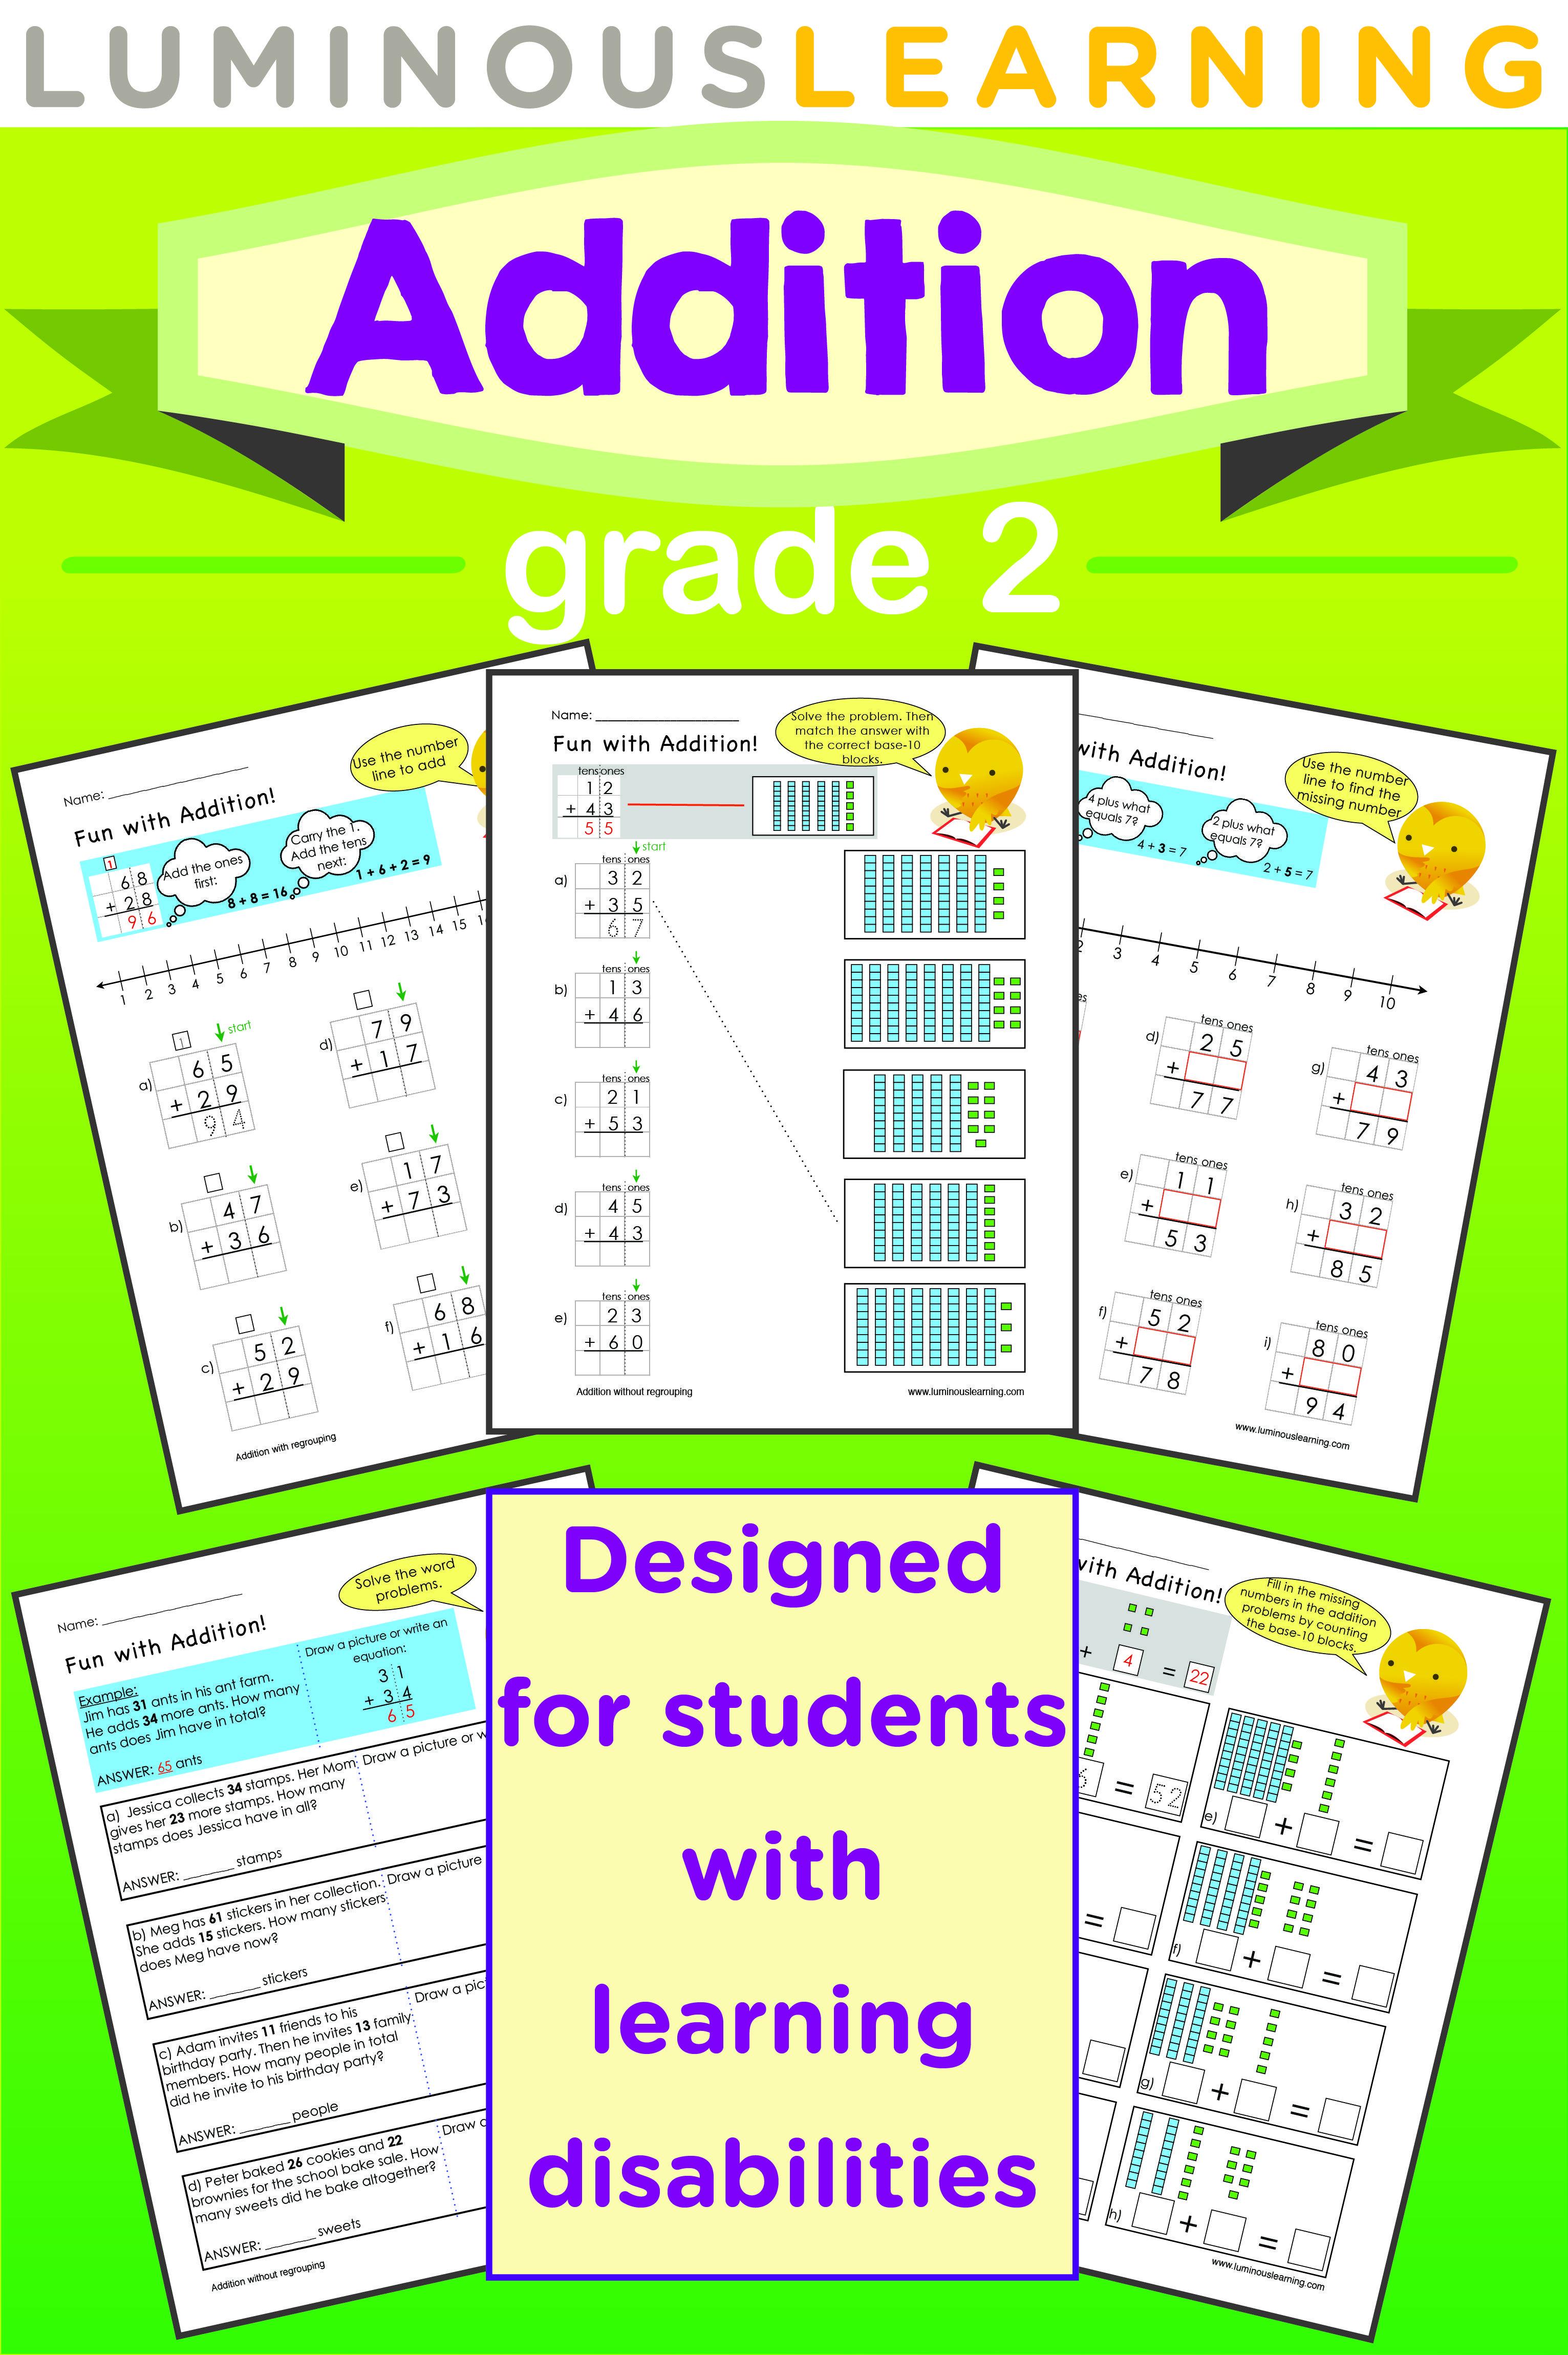 Luminous Learning Grade 2 Addition Workbook Helps